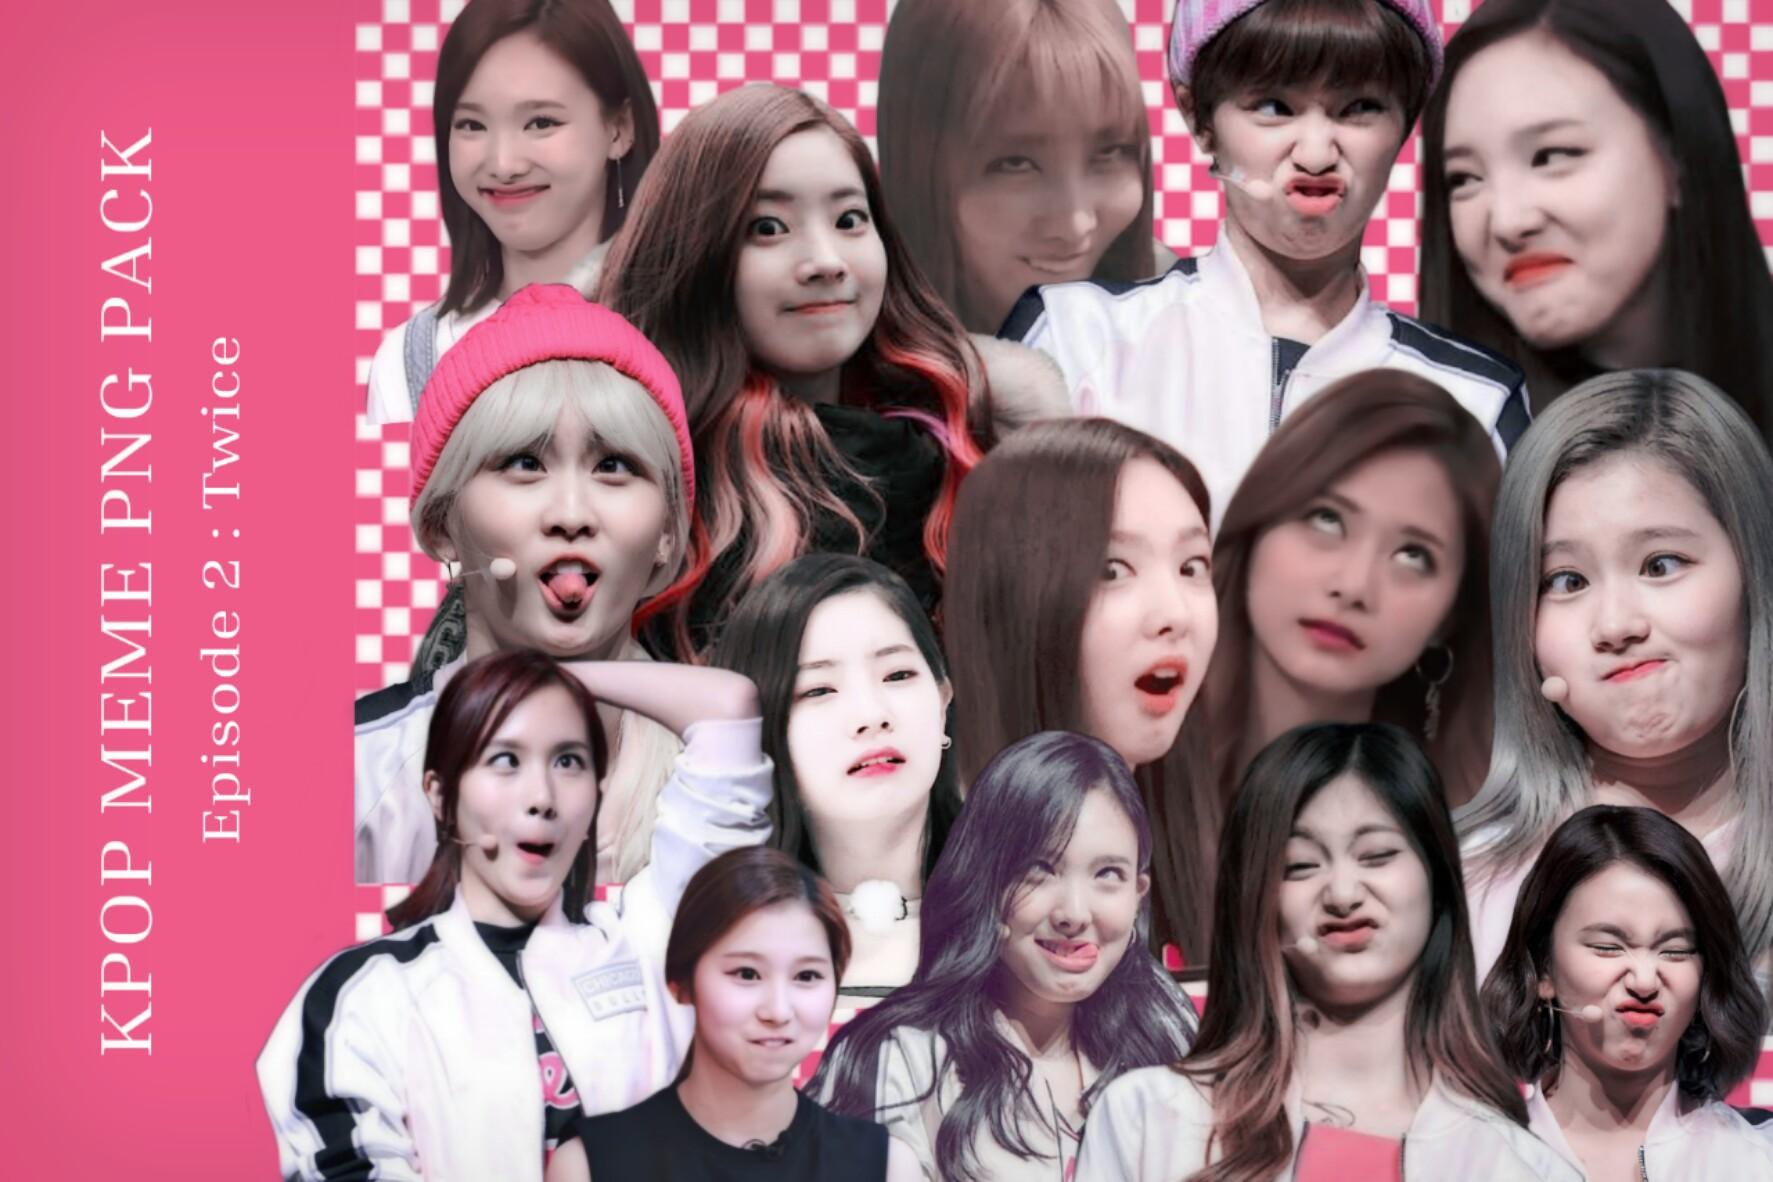 Kpop Meme Png Pack Episode 2 Twice By Lealbum On Deviantart